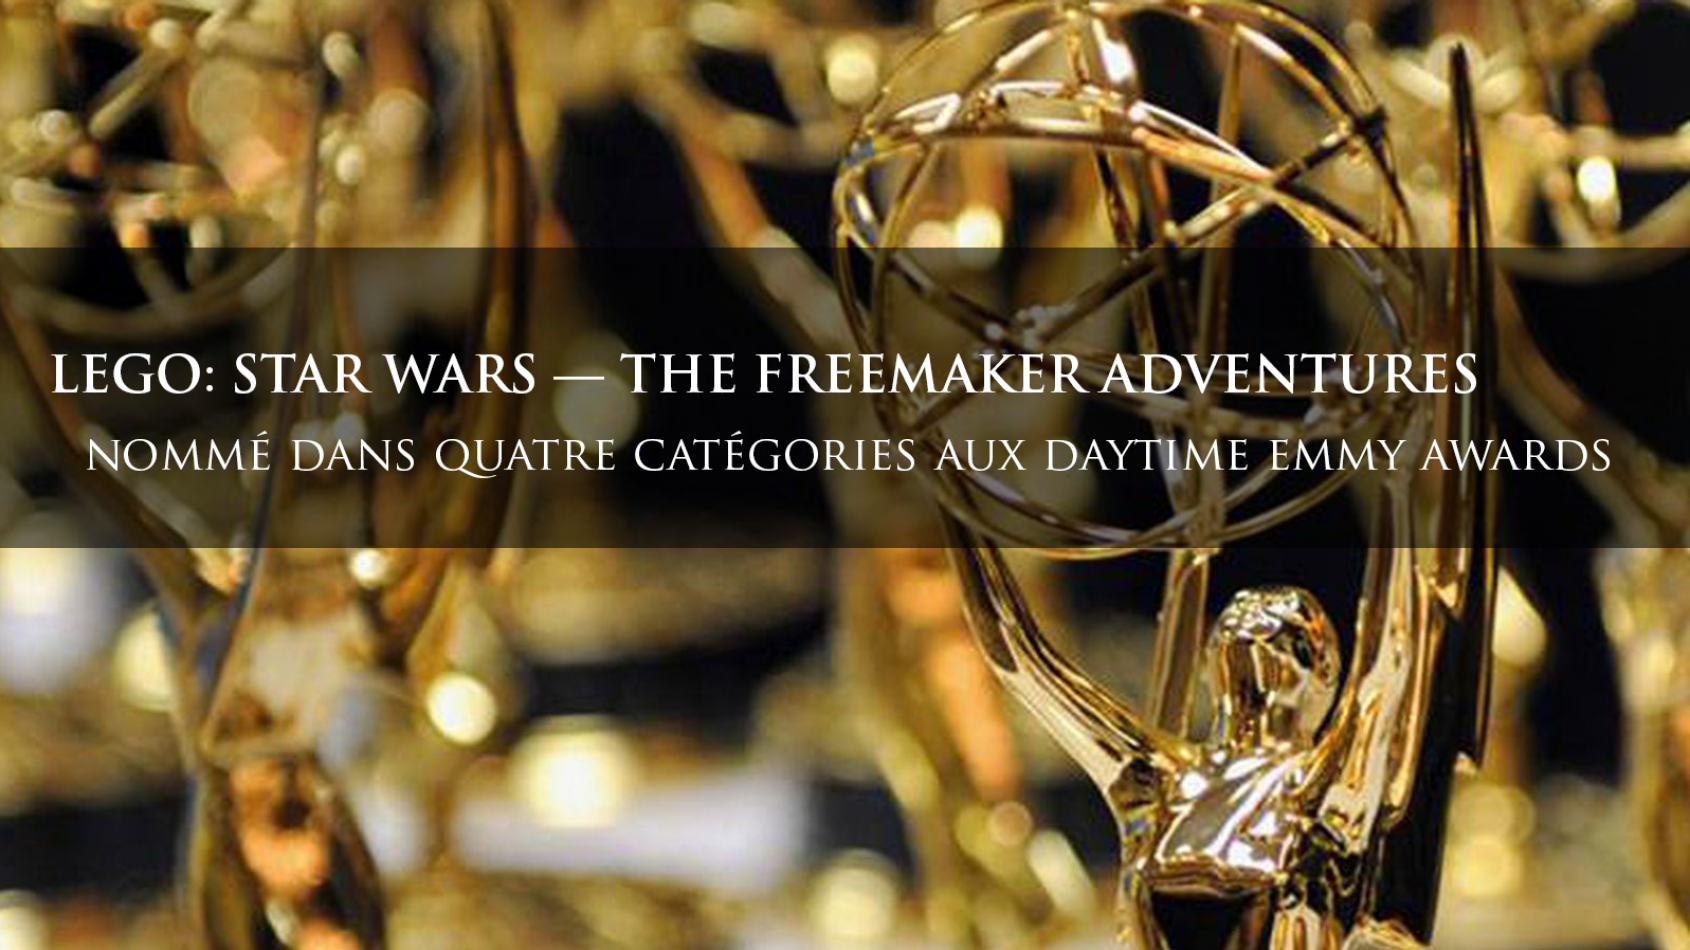 LEGO Star Wars: The Freemaker Adventures nommé aux Daytime Emmy Awards